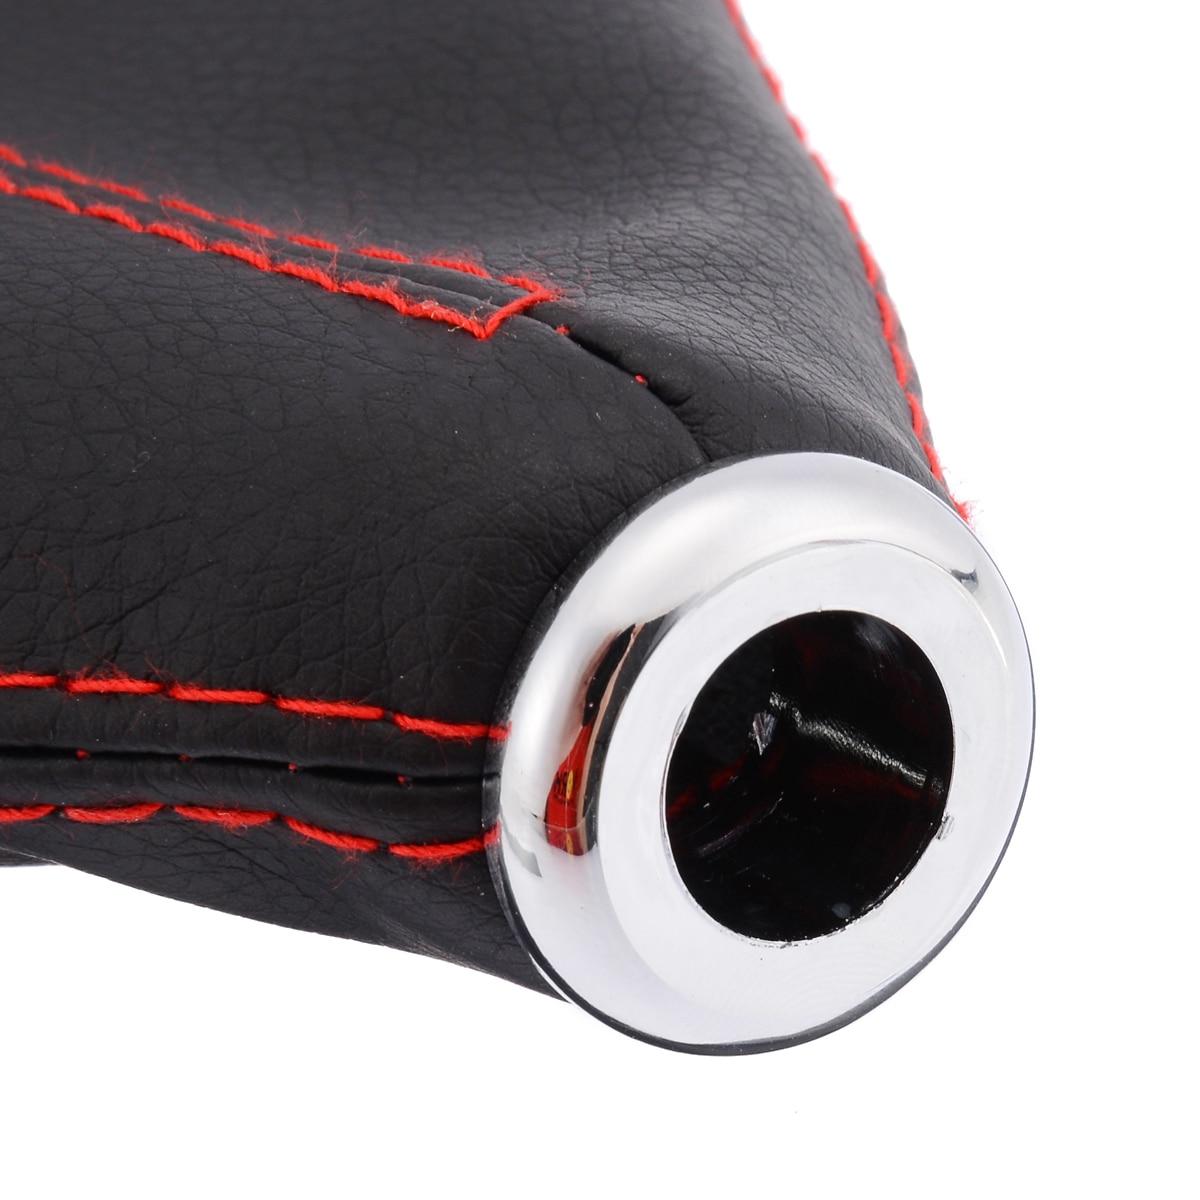 "Treyues 1pc 15mm/0.6"" Universal PU Leather Car Auto Gear Shift Collars Car Manual Shifter Gear Shift Boot Cover Gaiter"